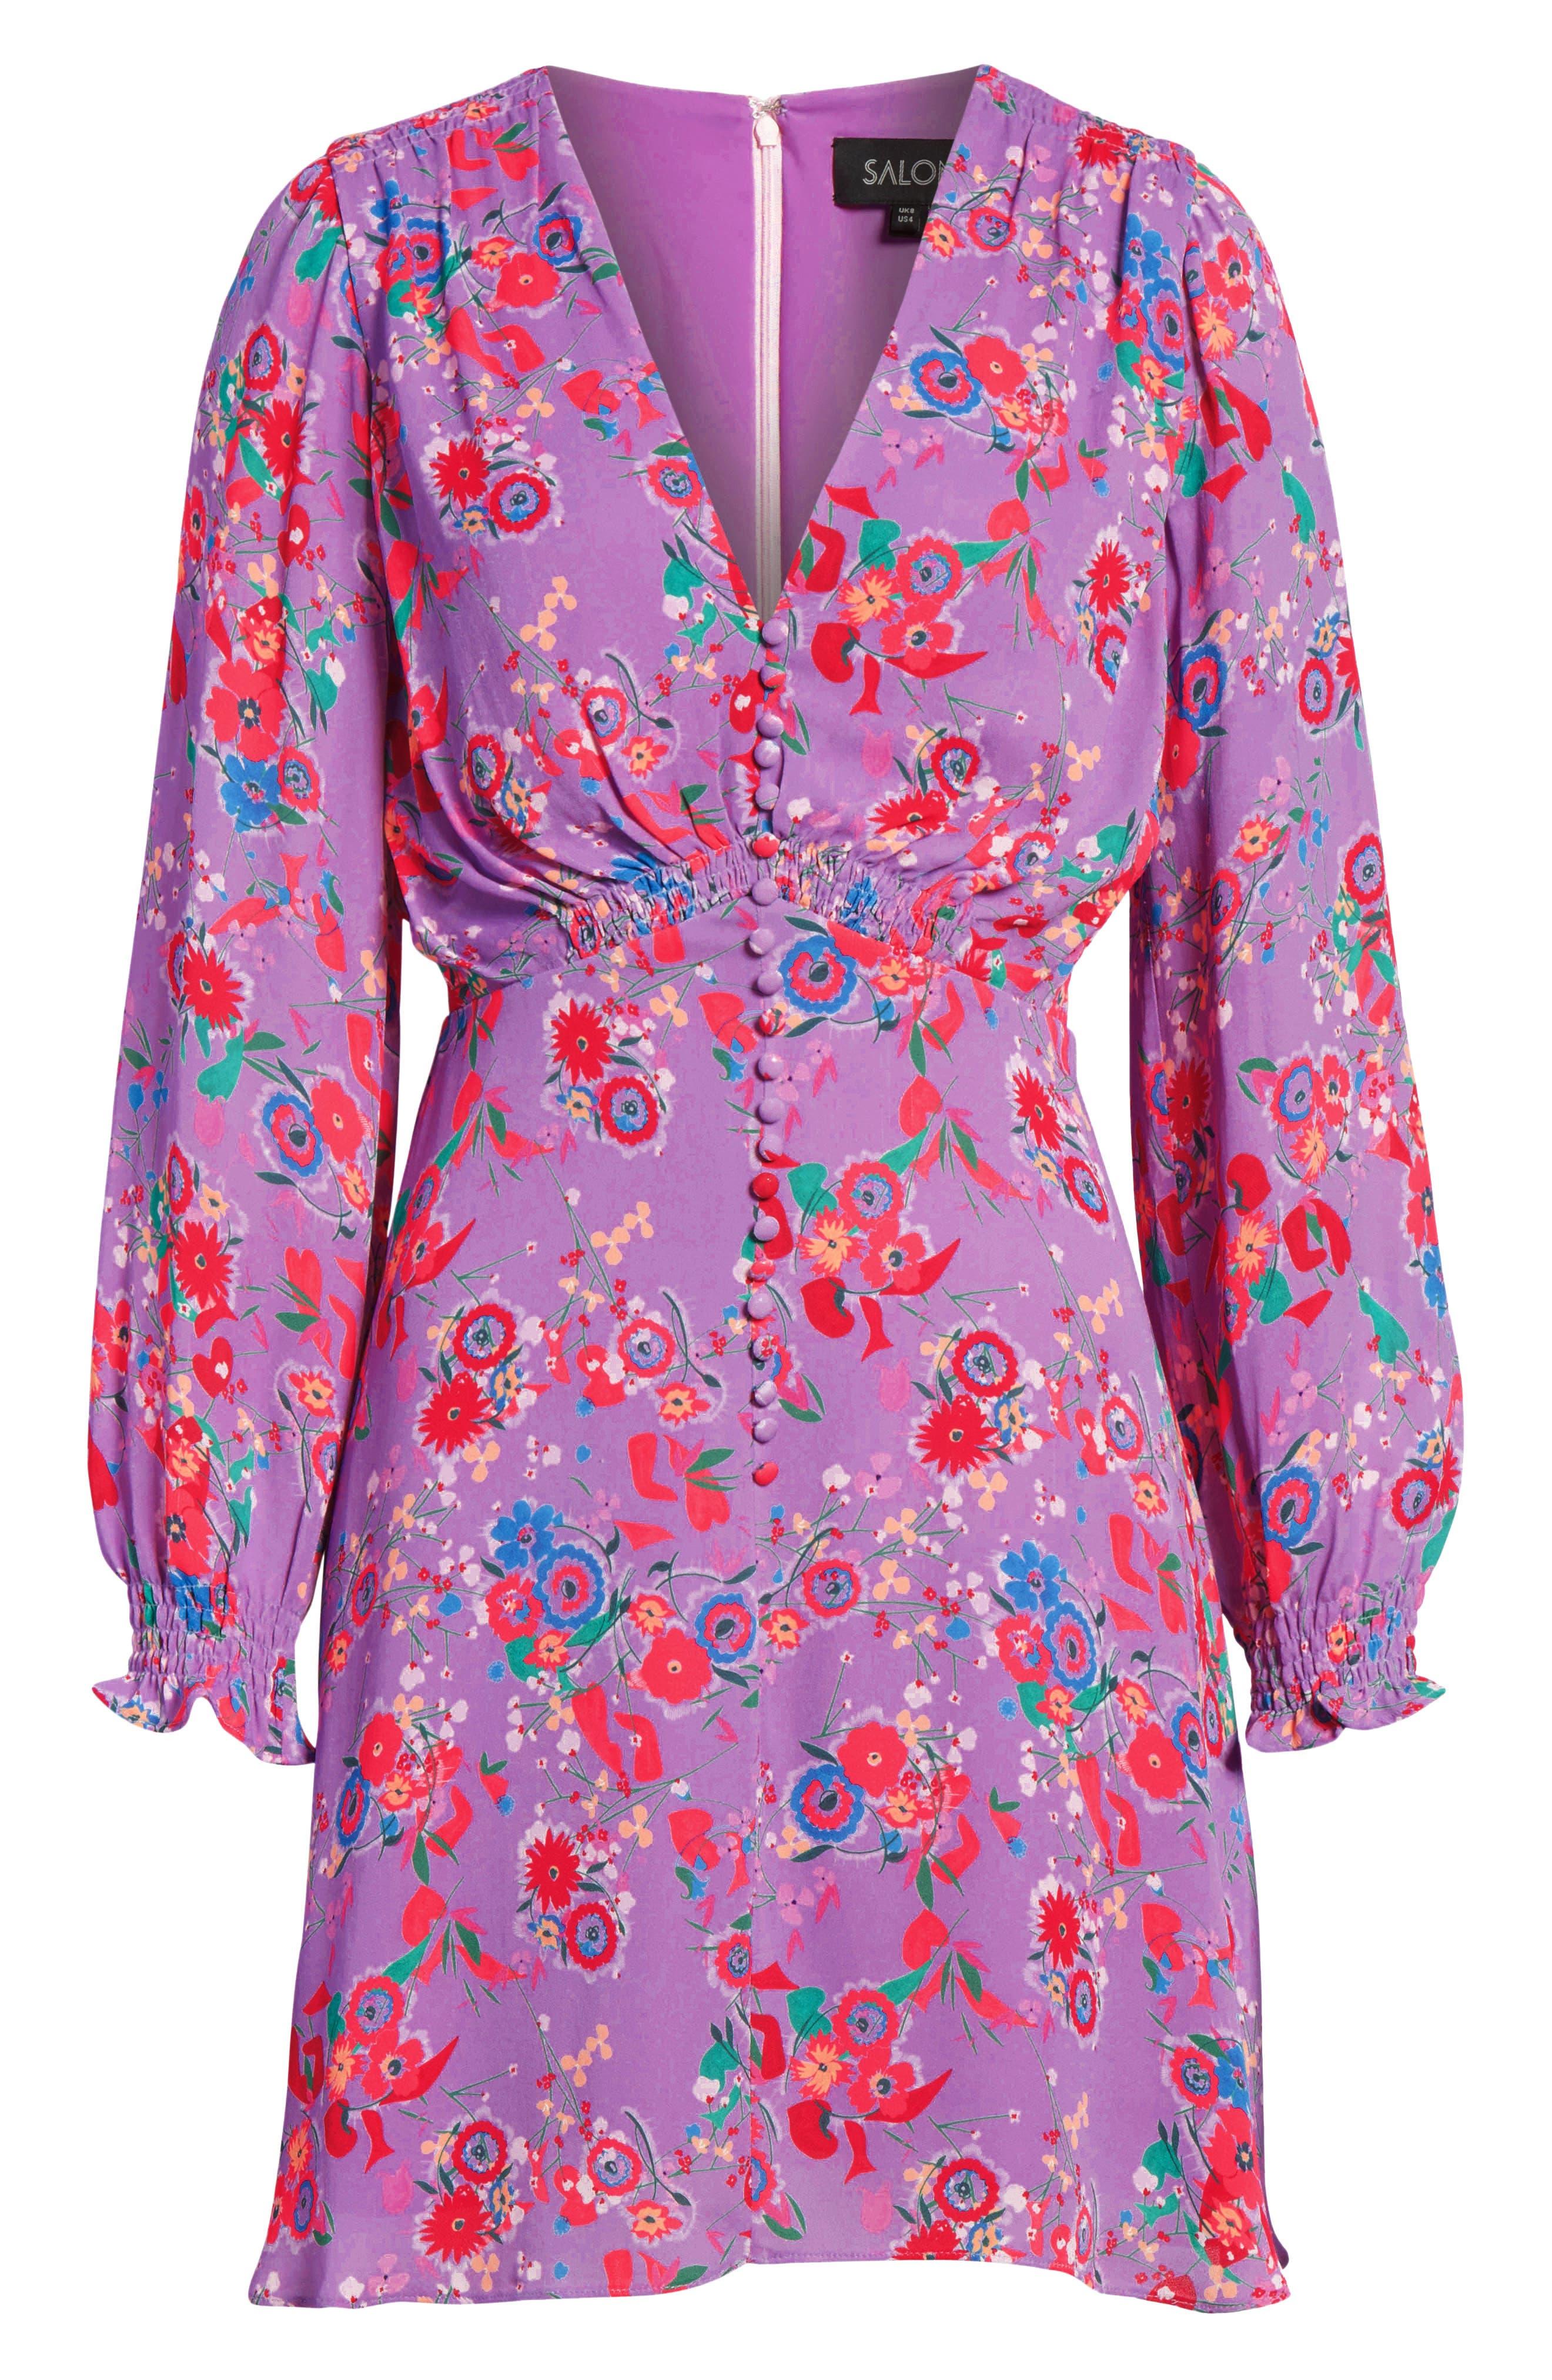 Eve Floral Print Dress,                             Alternate thumbnail 7, color,                             531